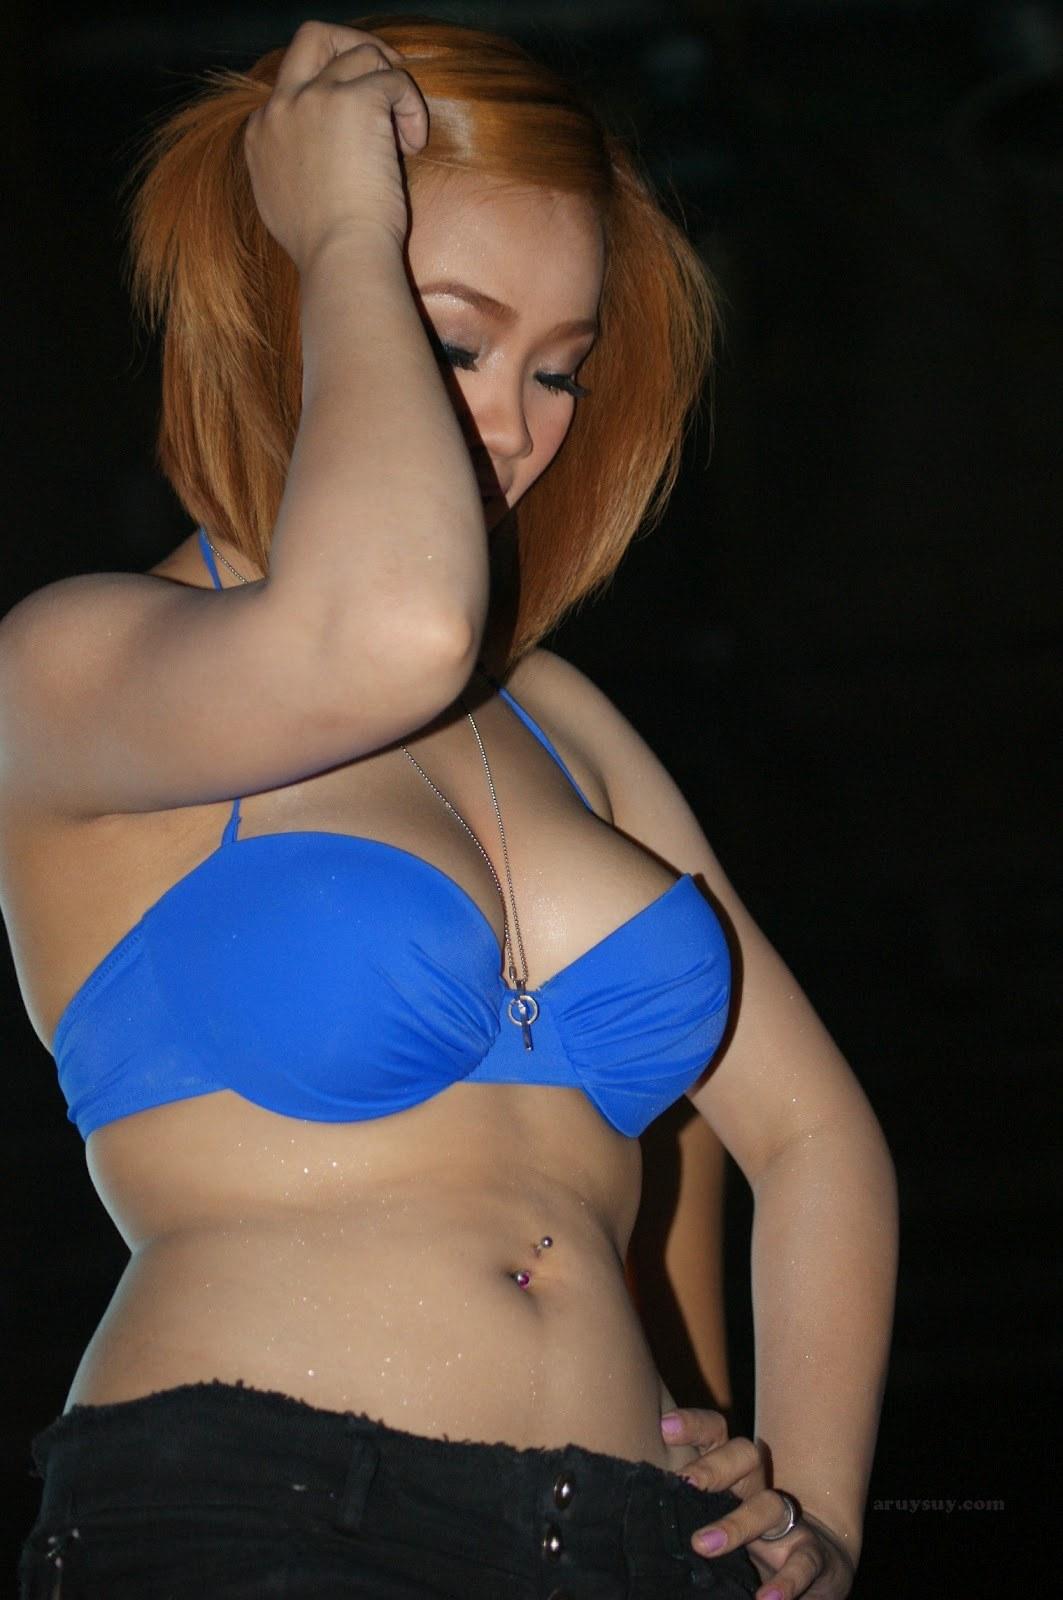 blonde, Girl, Sexy, Female, Babe, Bikini, Brunette, Model